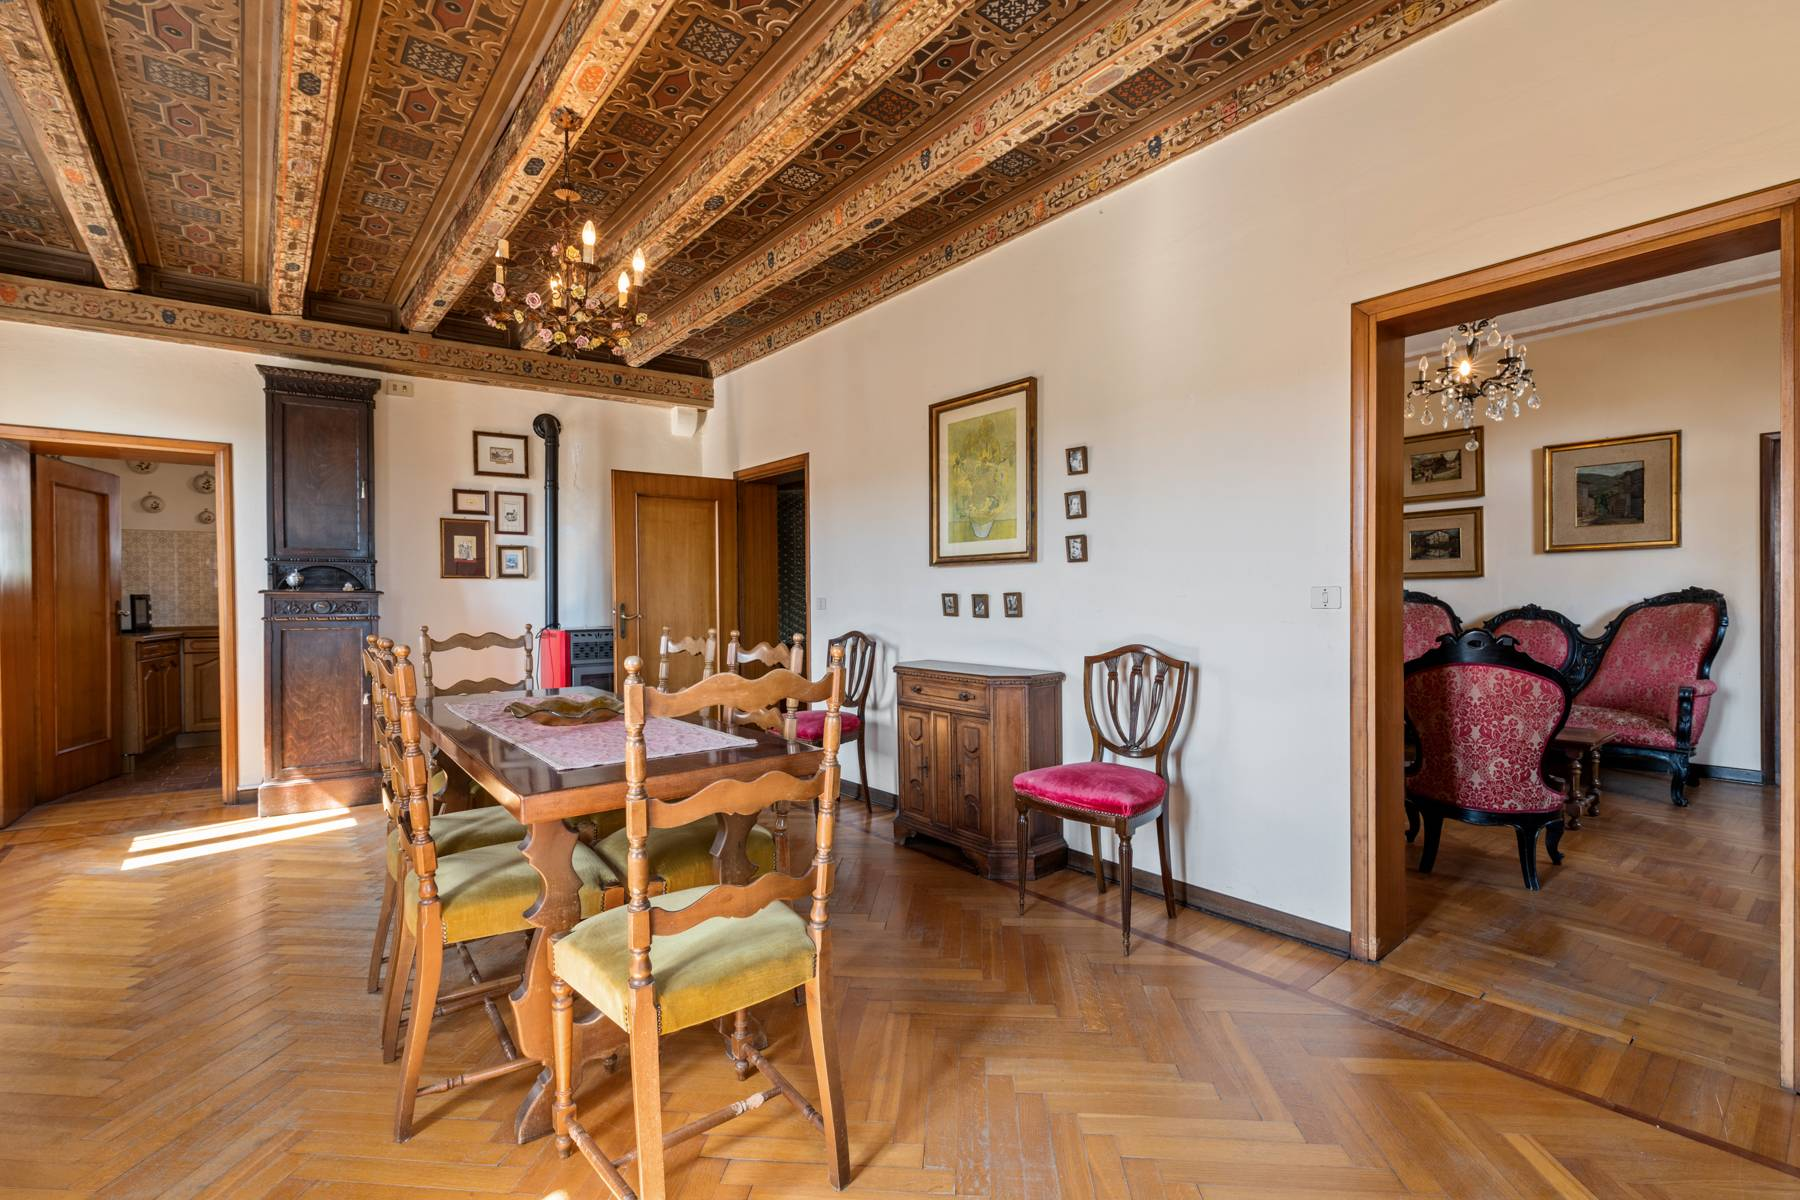 Elegant 17th century Venetian Villa with park on the hills of Treviso - 6